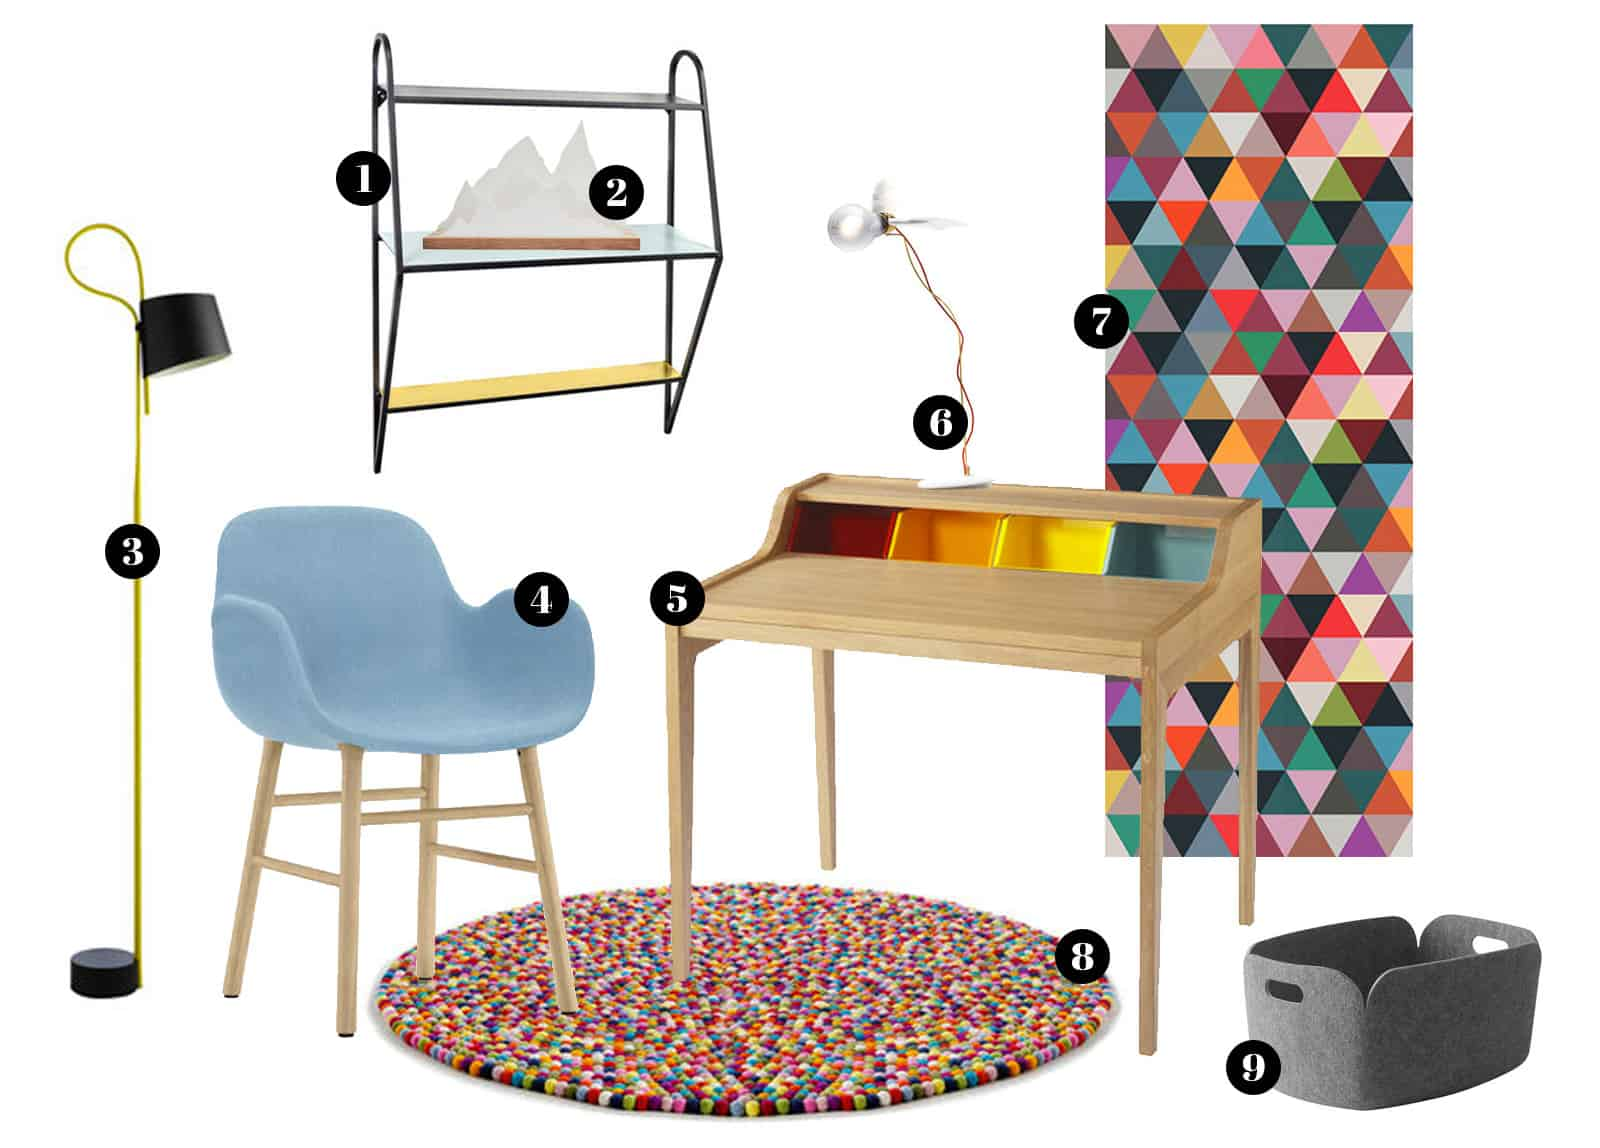 3 ambiances de bureau design shopper sur madeindesign. Black Bedroom Furniture Sets. Home Design Ideas